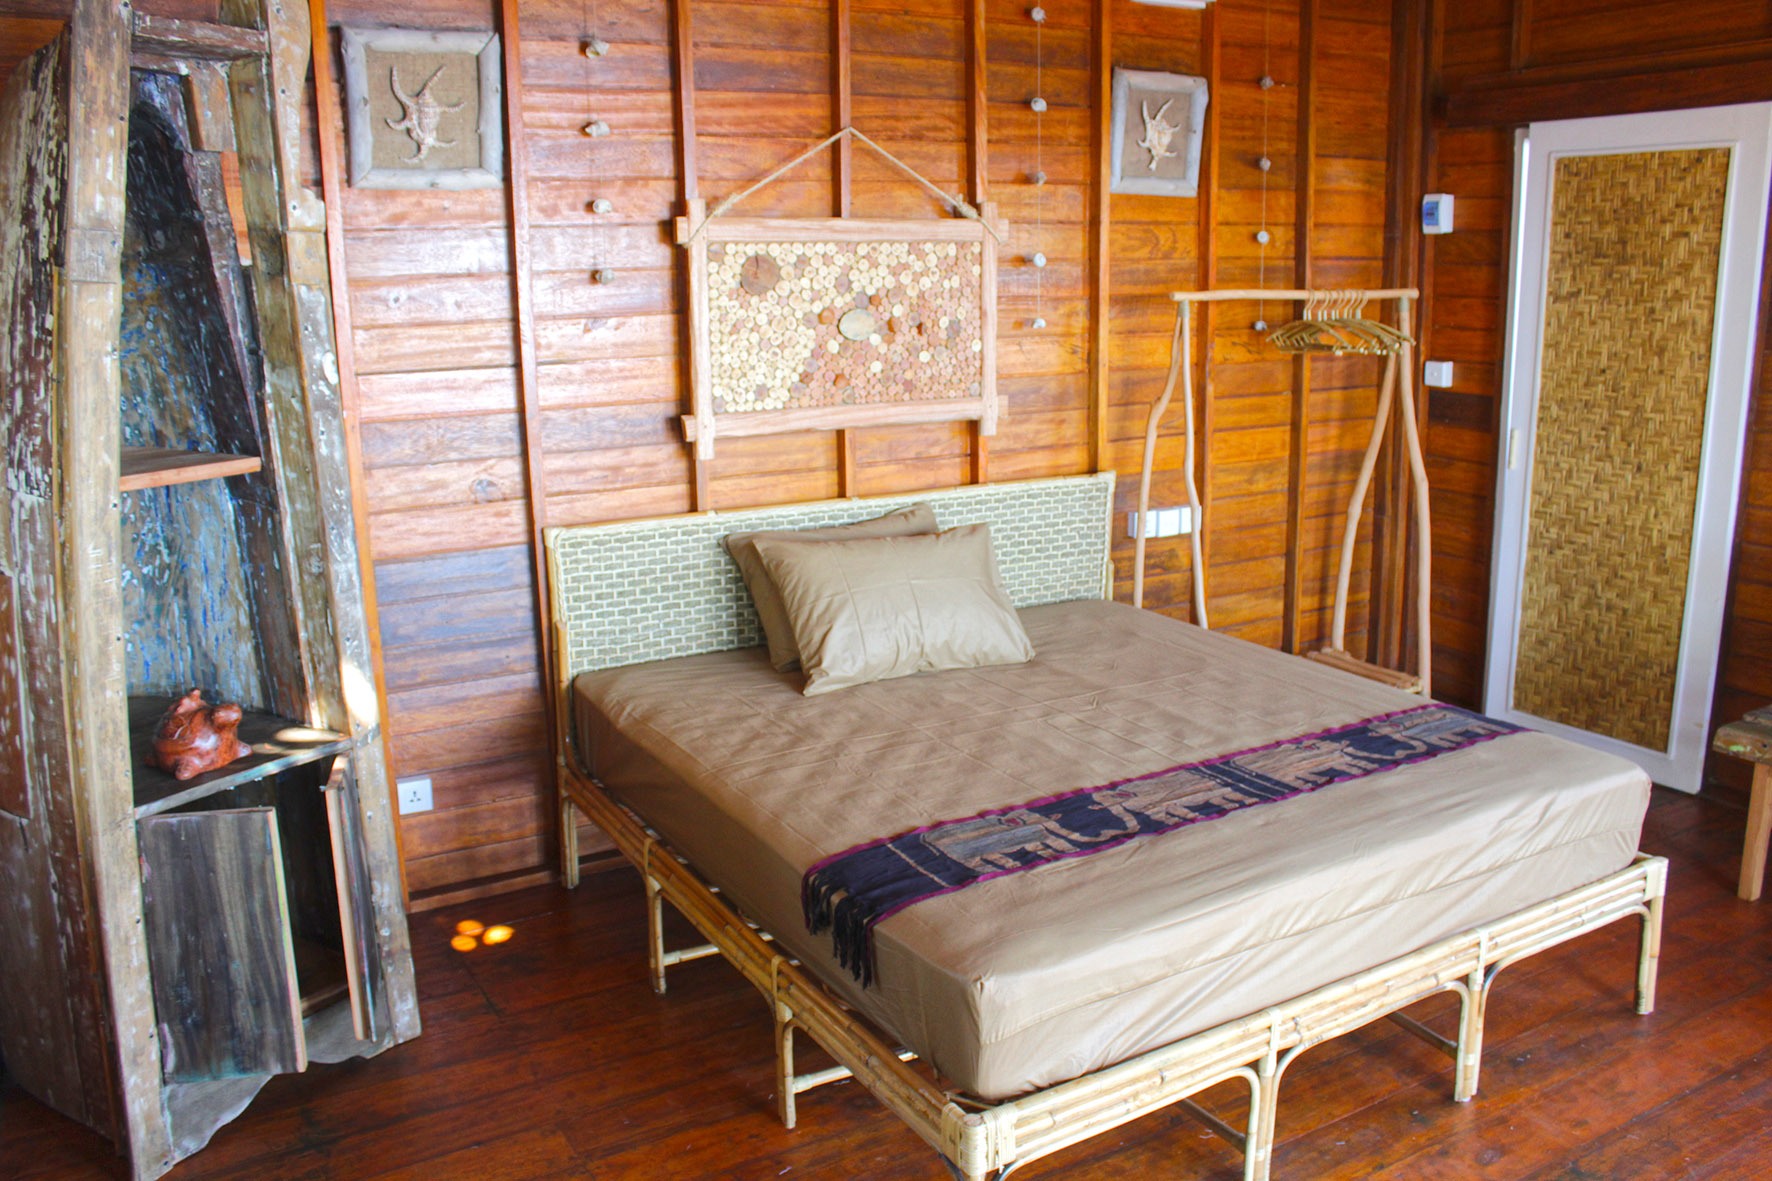 Interior of bungalow at Hula Hoop